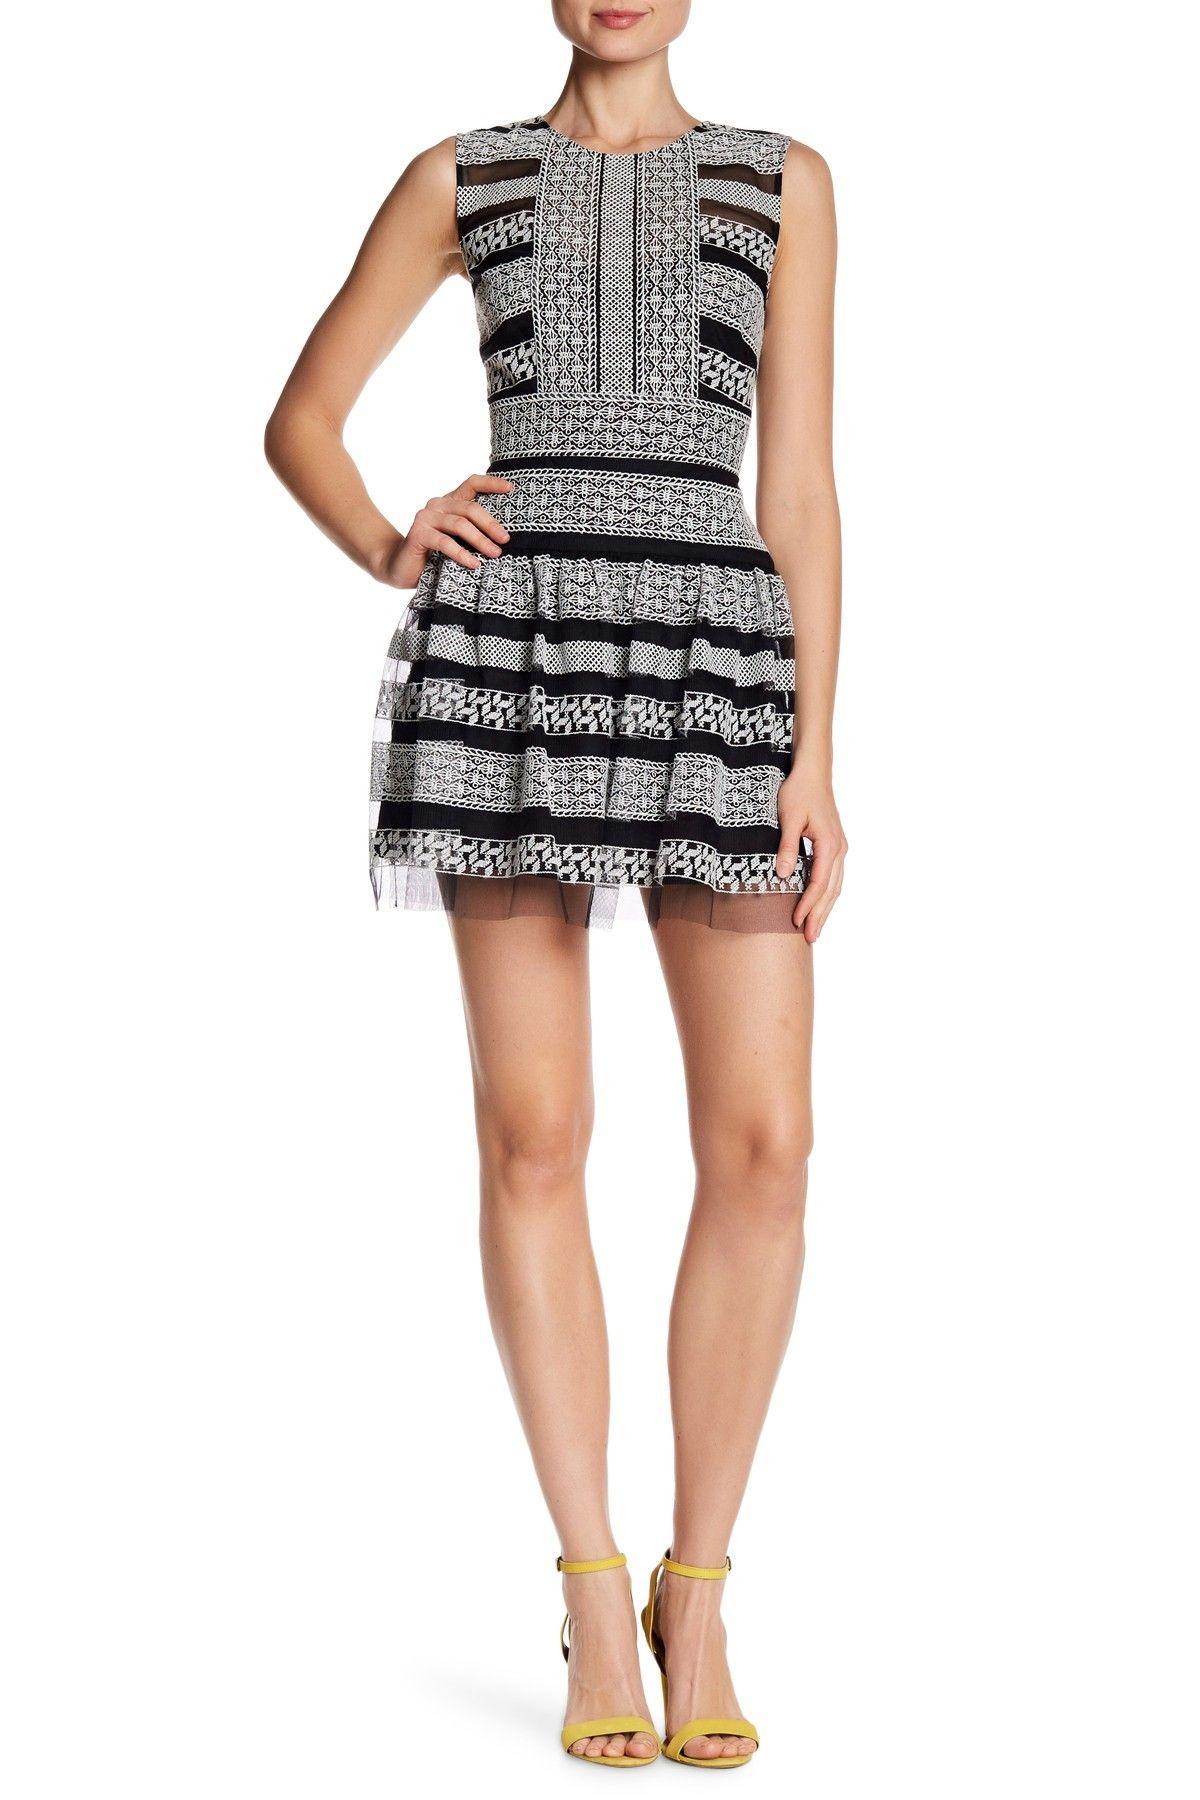 Bcbg maxazria knit evening dress womenus style edgy pinterest